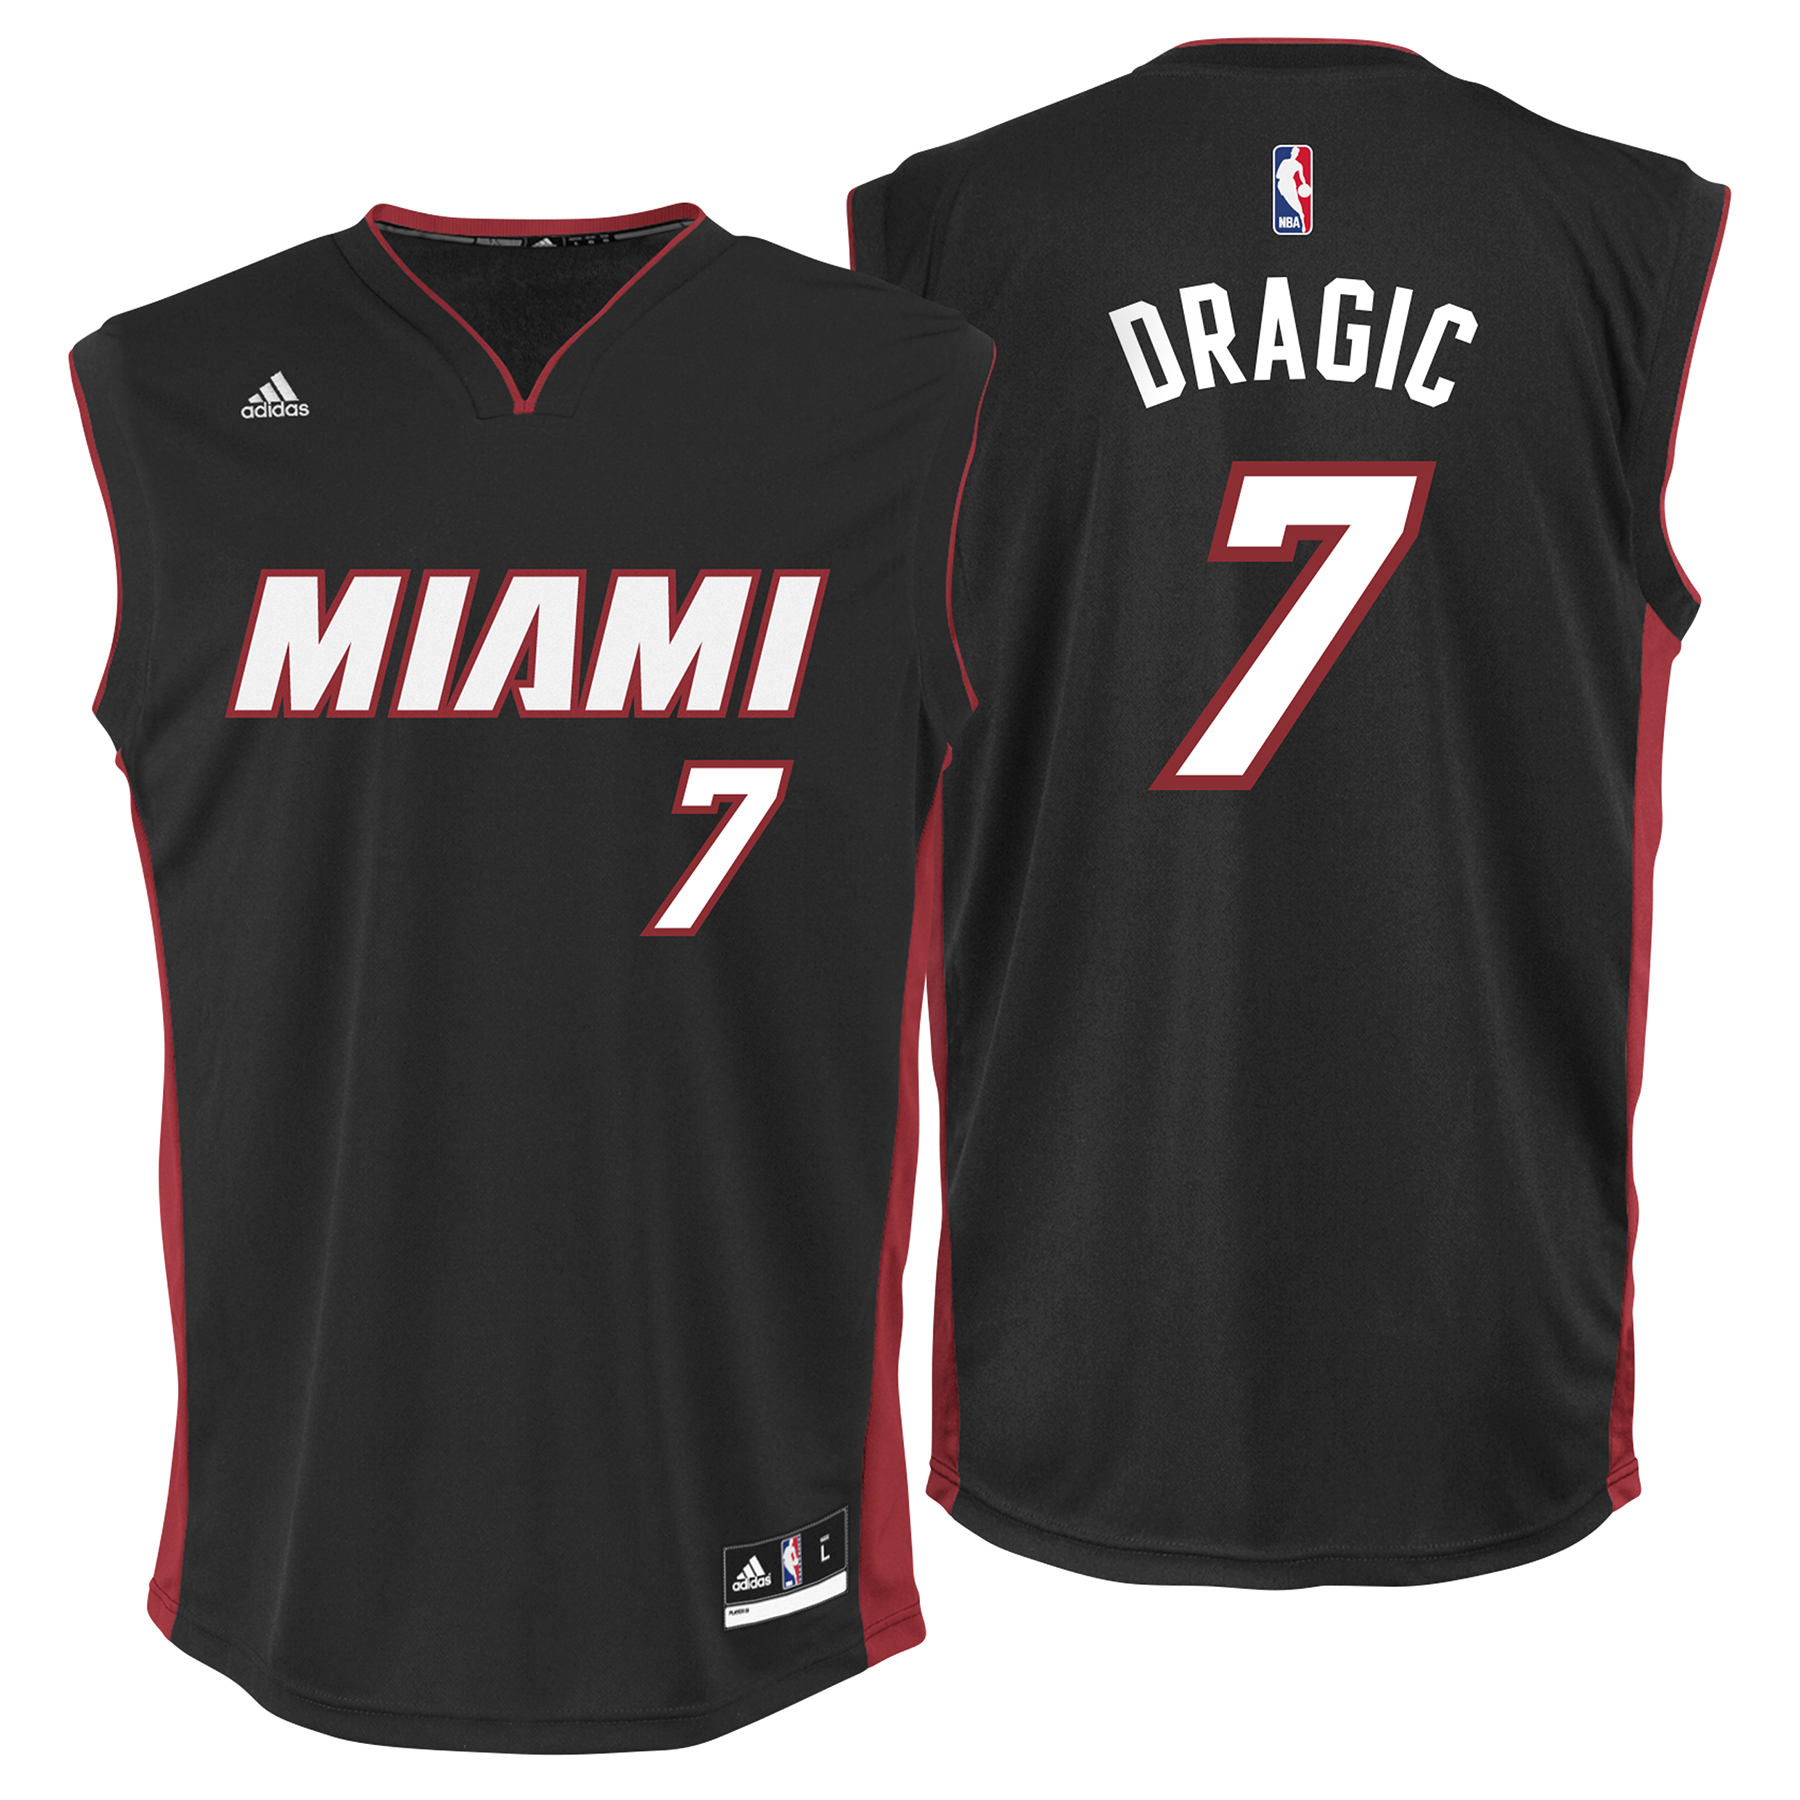 Image of Miami Heat Road Replica Jersey - Goran Dragic - Mens